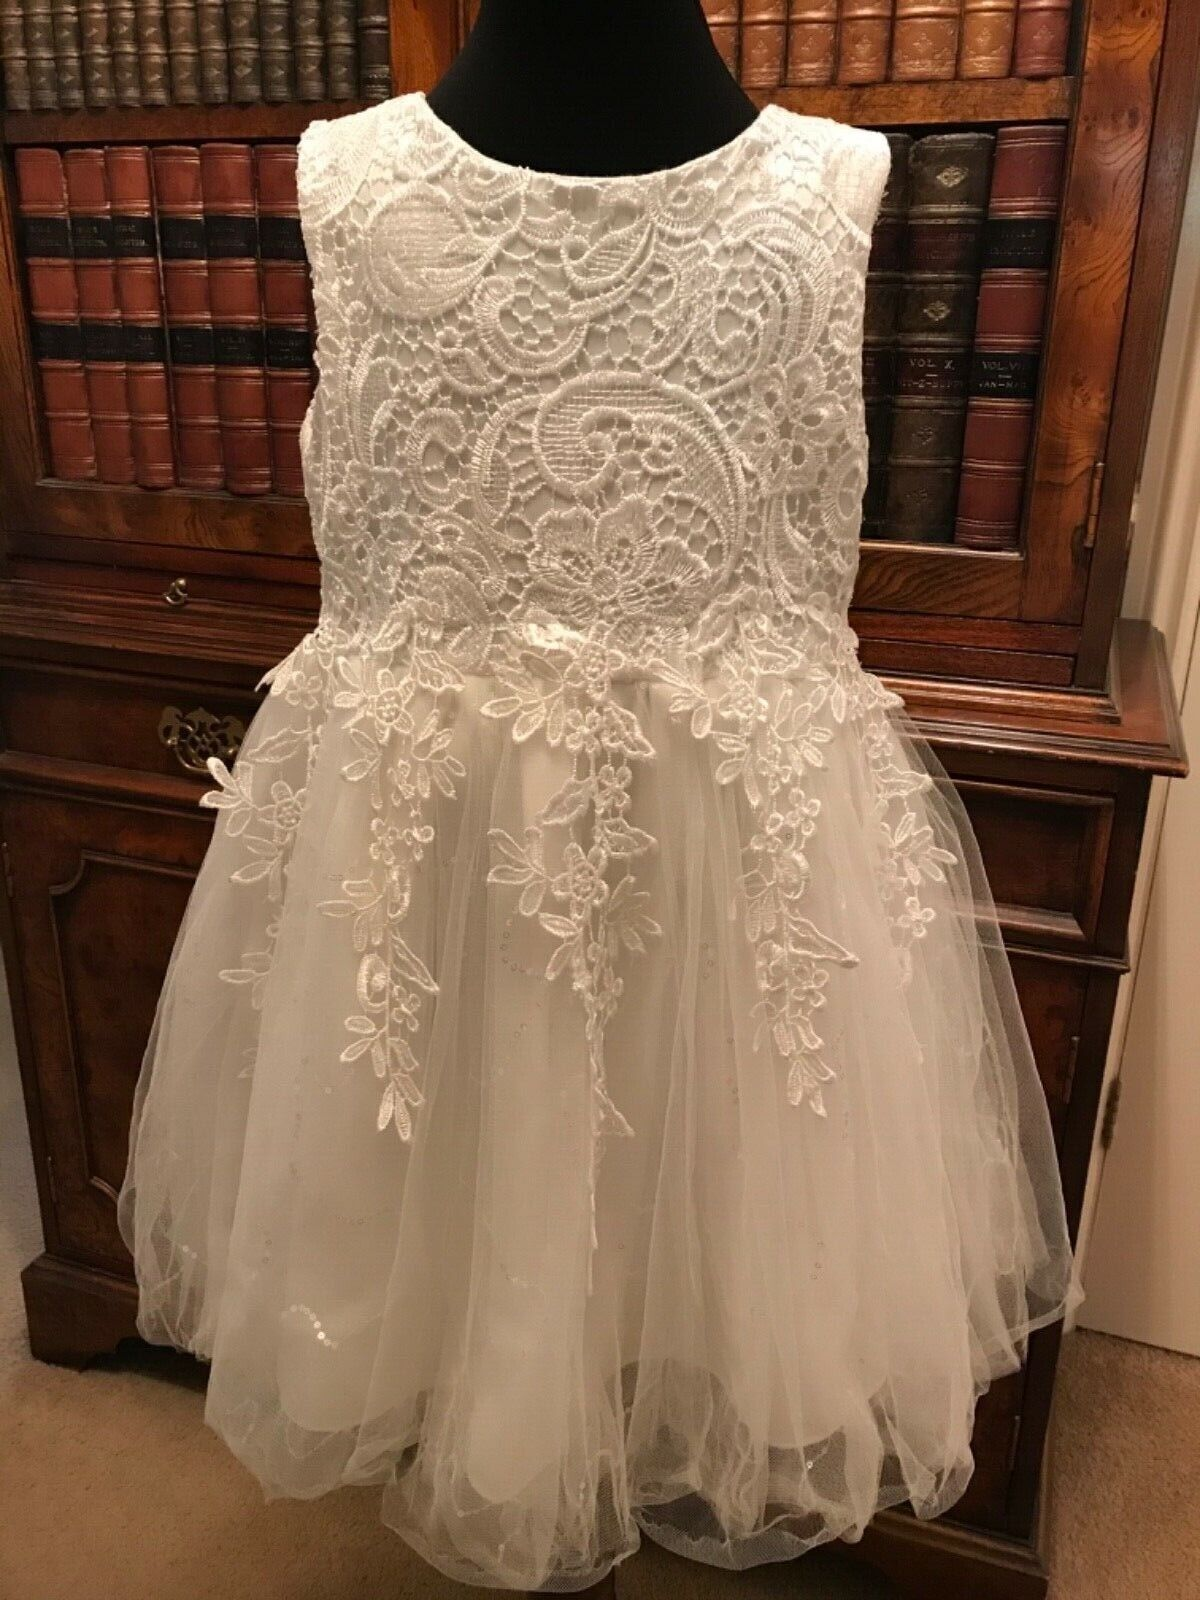 Beautiful Girls' Cream Satin, Tulle, Sparkle & Lace Bridesmaid Dress - 4-5 Years